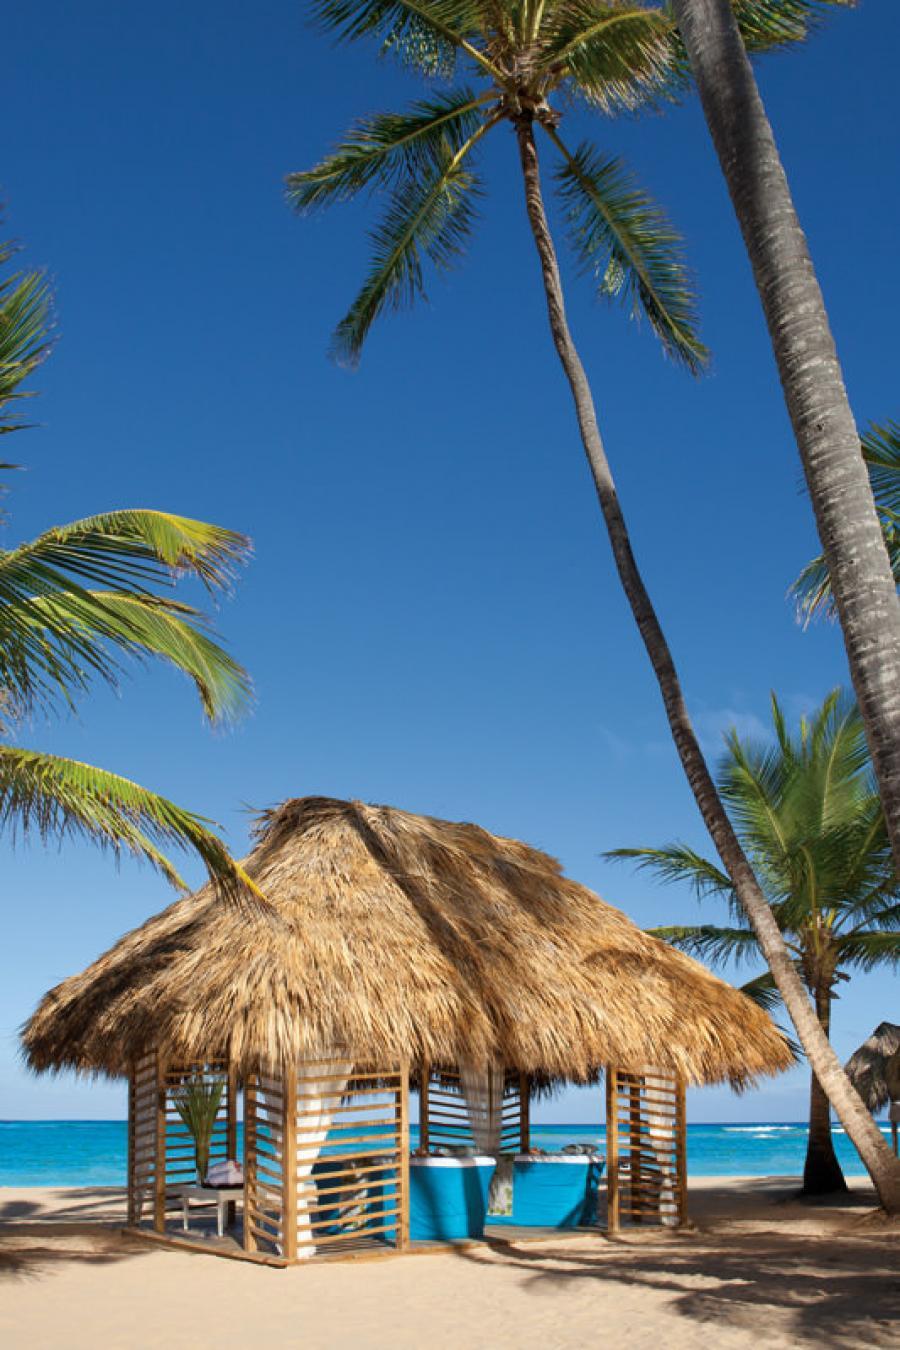 Dreams Punta Cana, Dominican Republic